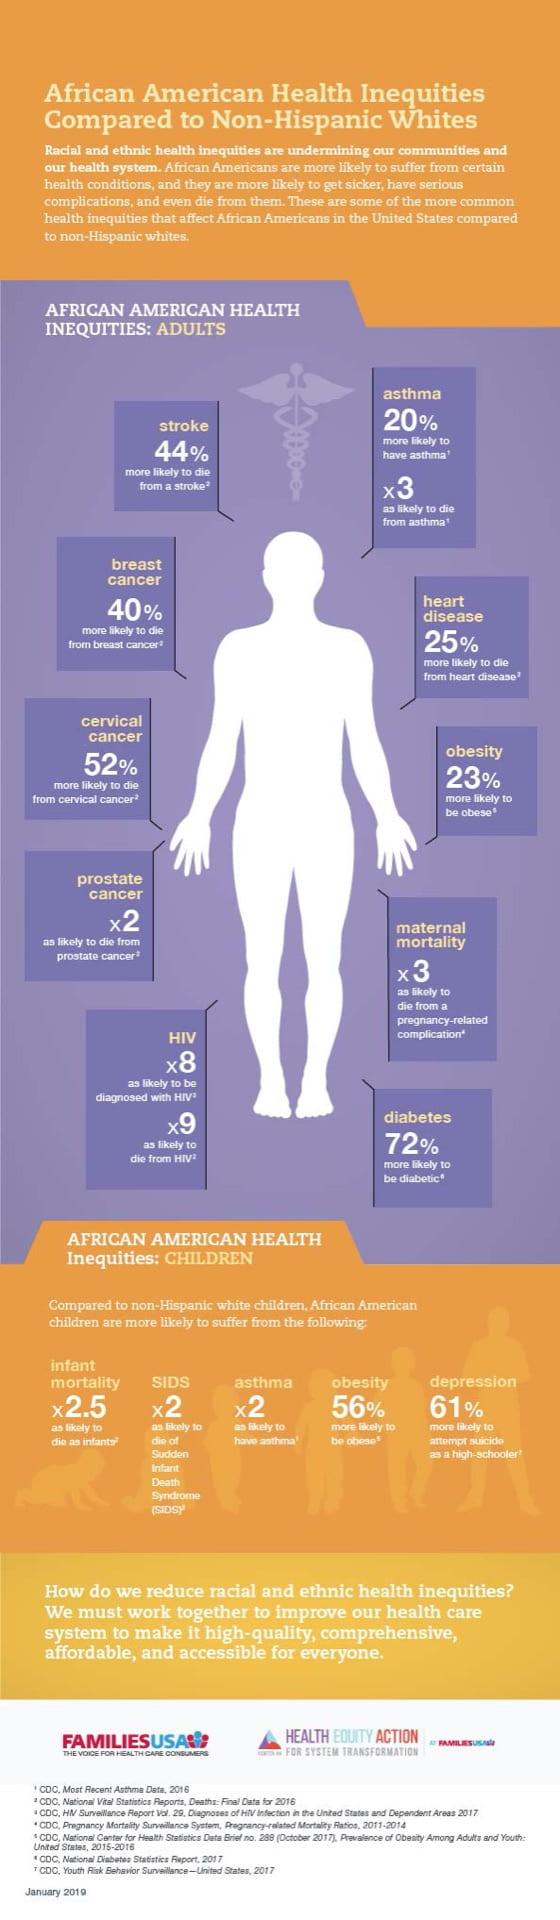 Infocgrahipc on African American health inequities compared to non-Hispanic whites